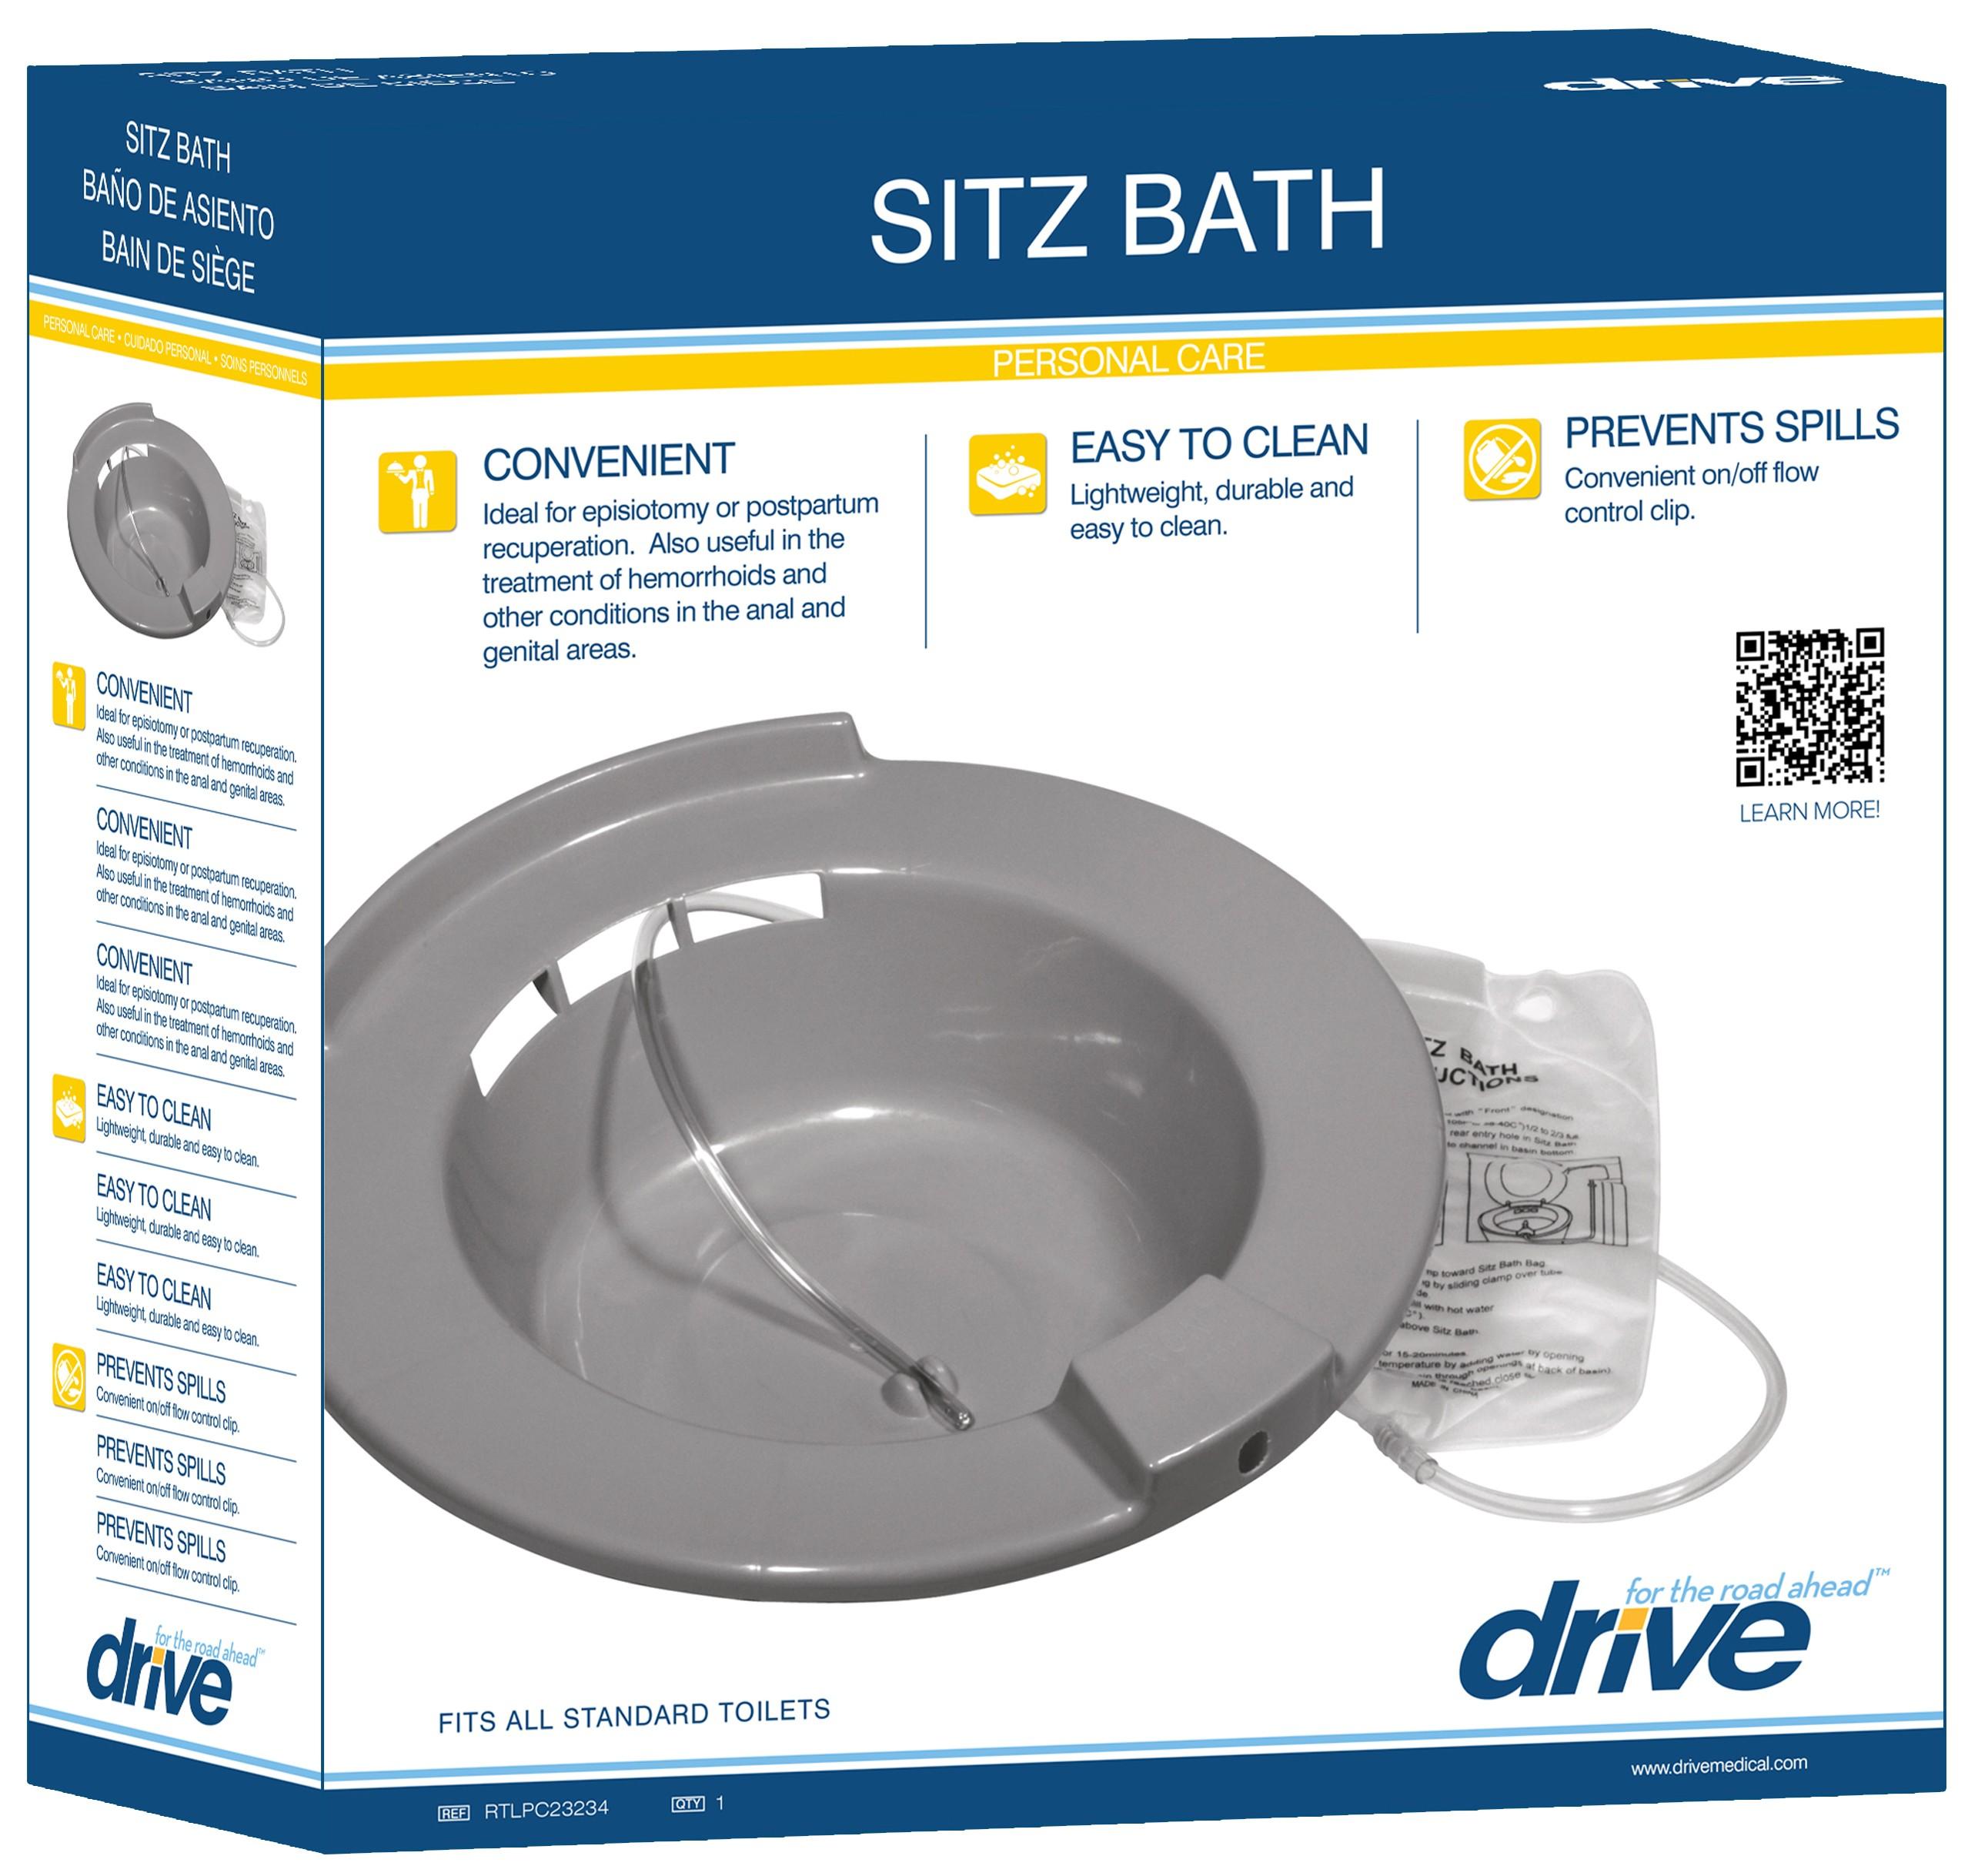 Drive Sitz Bath - On The Mend Medical Supplies & Equipment